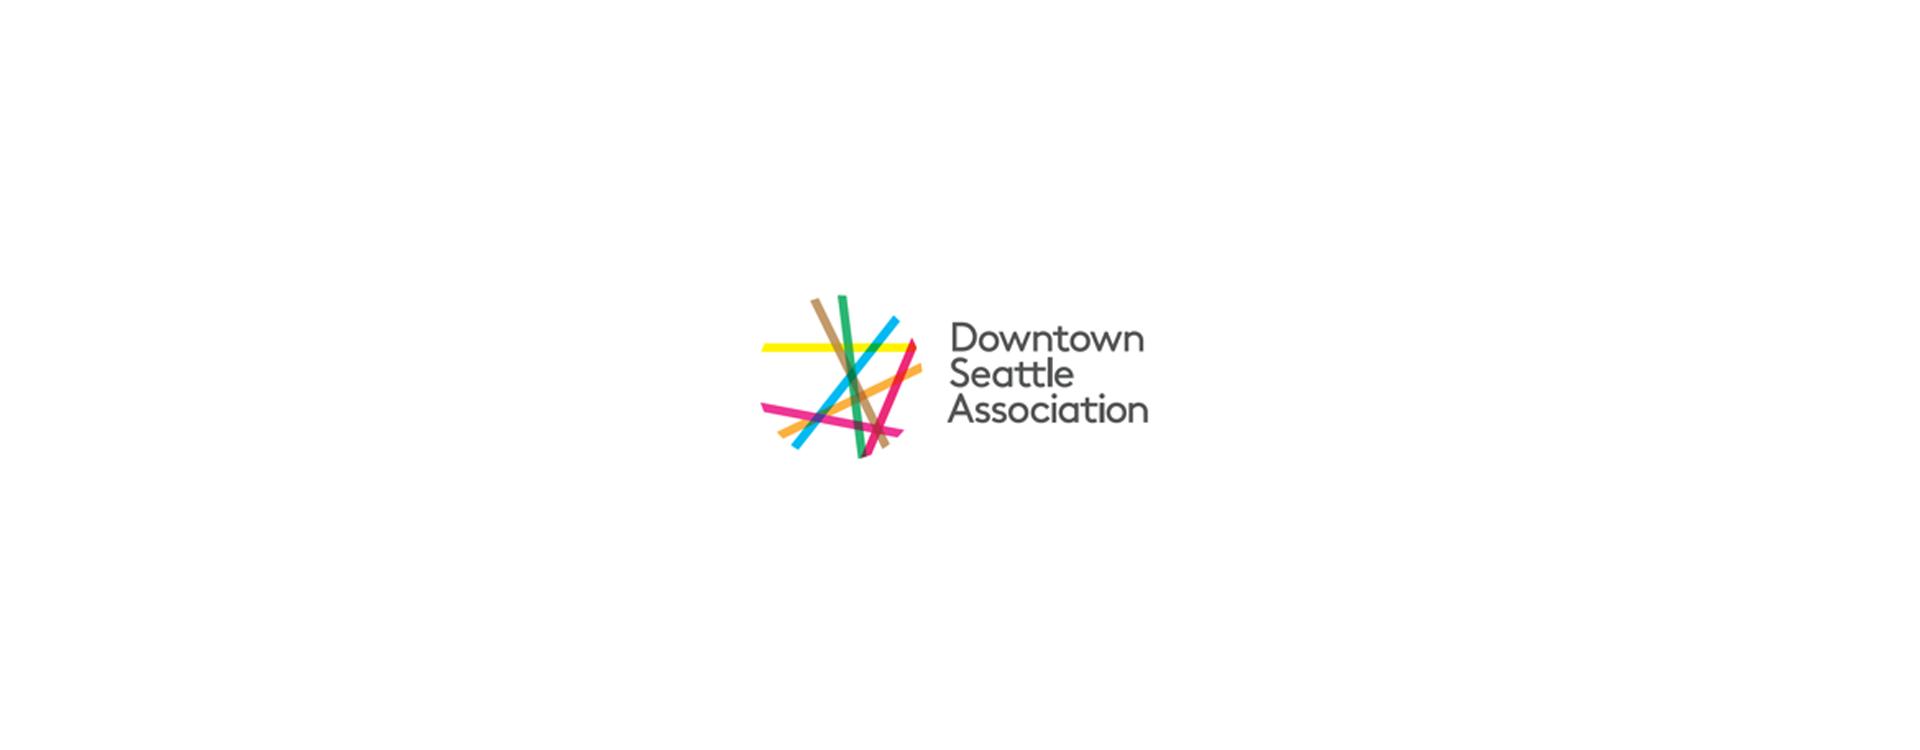 Downtown Seattle Association